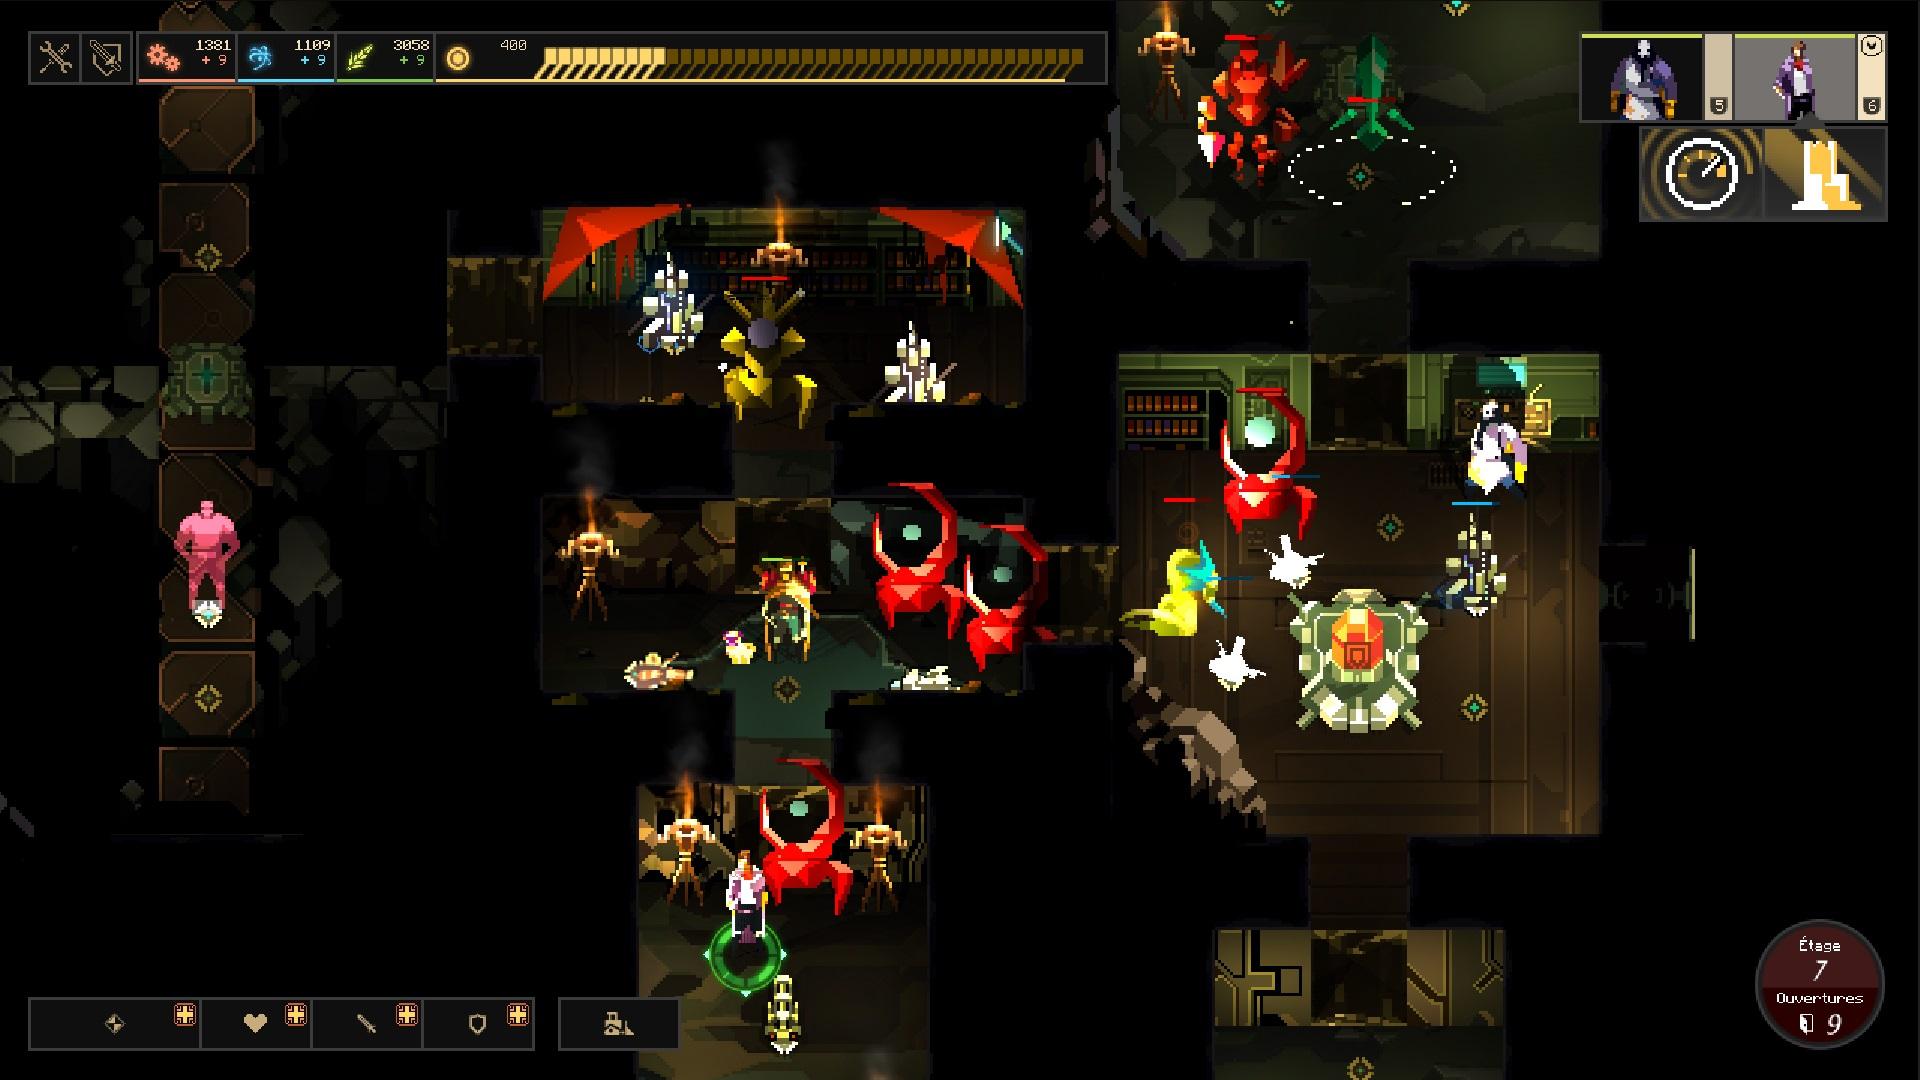 Dungeon_of_the_Endless_-_Beta_-_Drakken_Cave